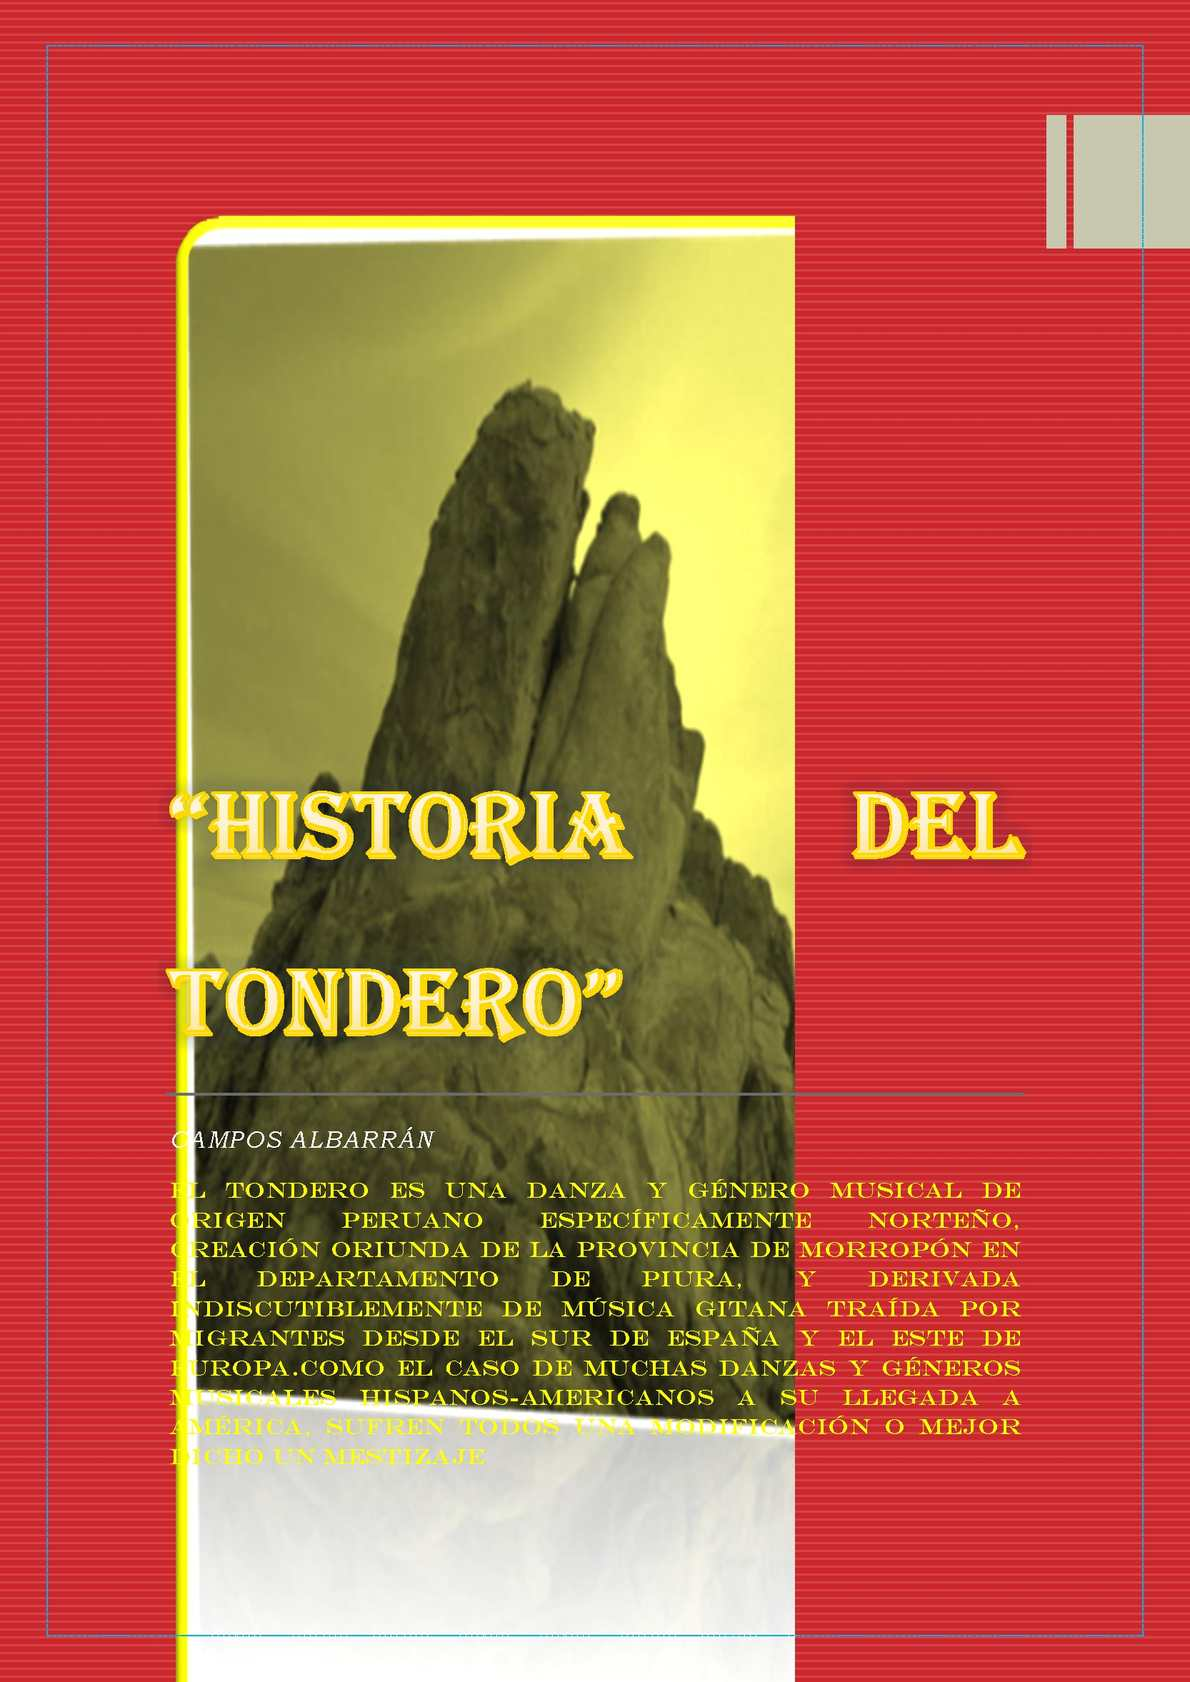 Calaméo Tondero